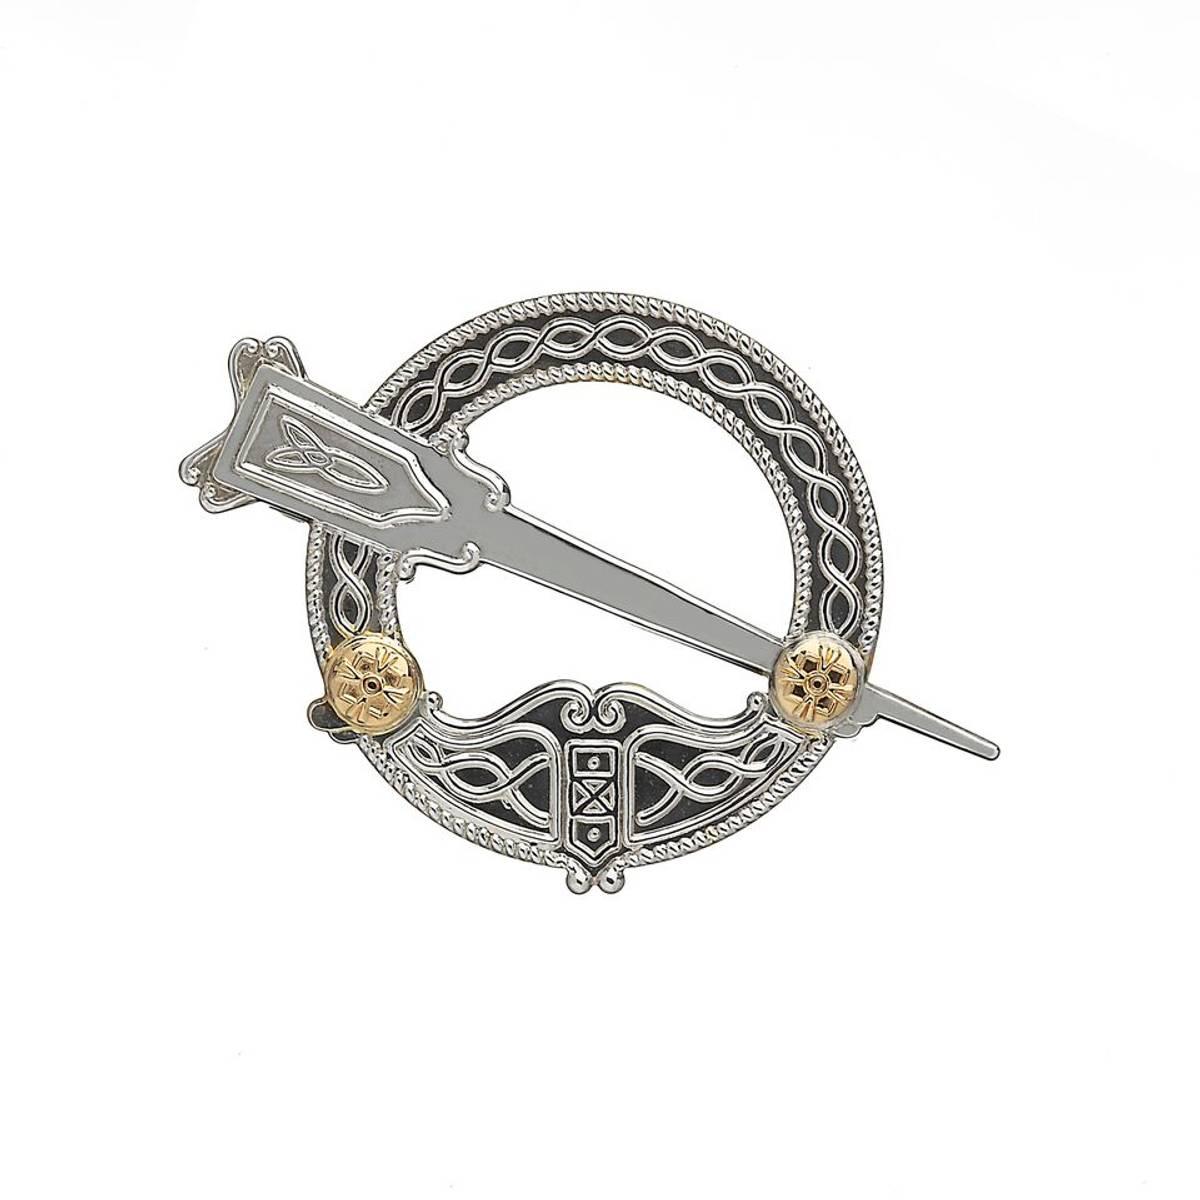 Arda silver traditional small Tara Brooch with rare Irish gold Boss.ncddp